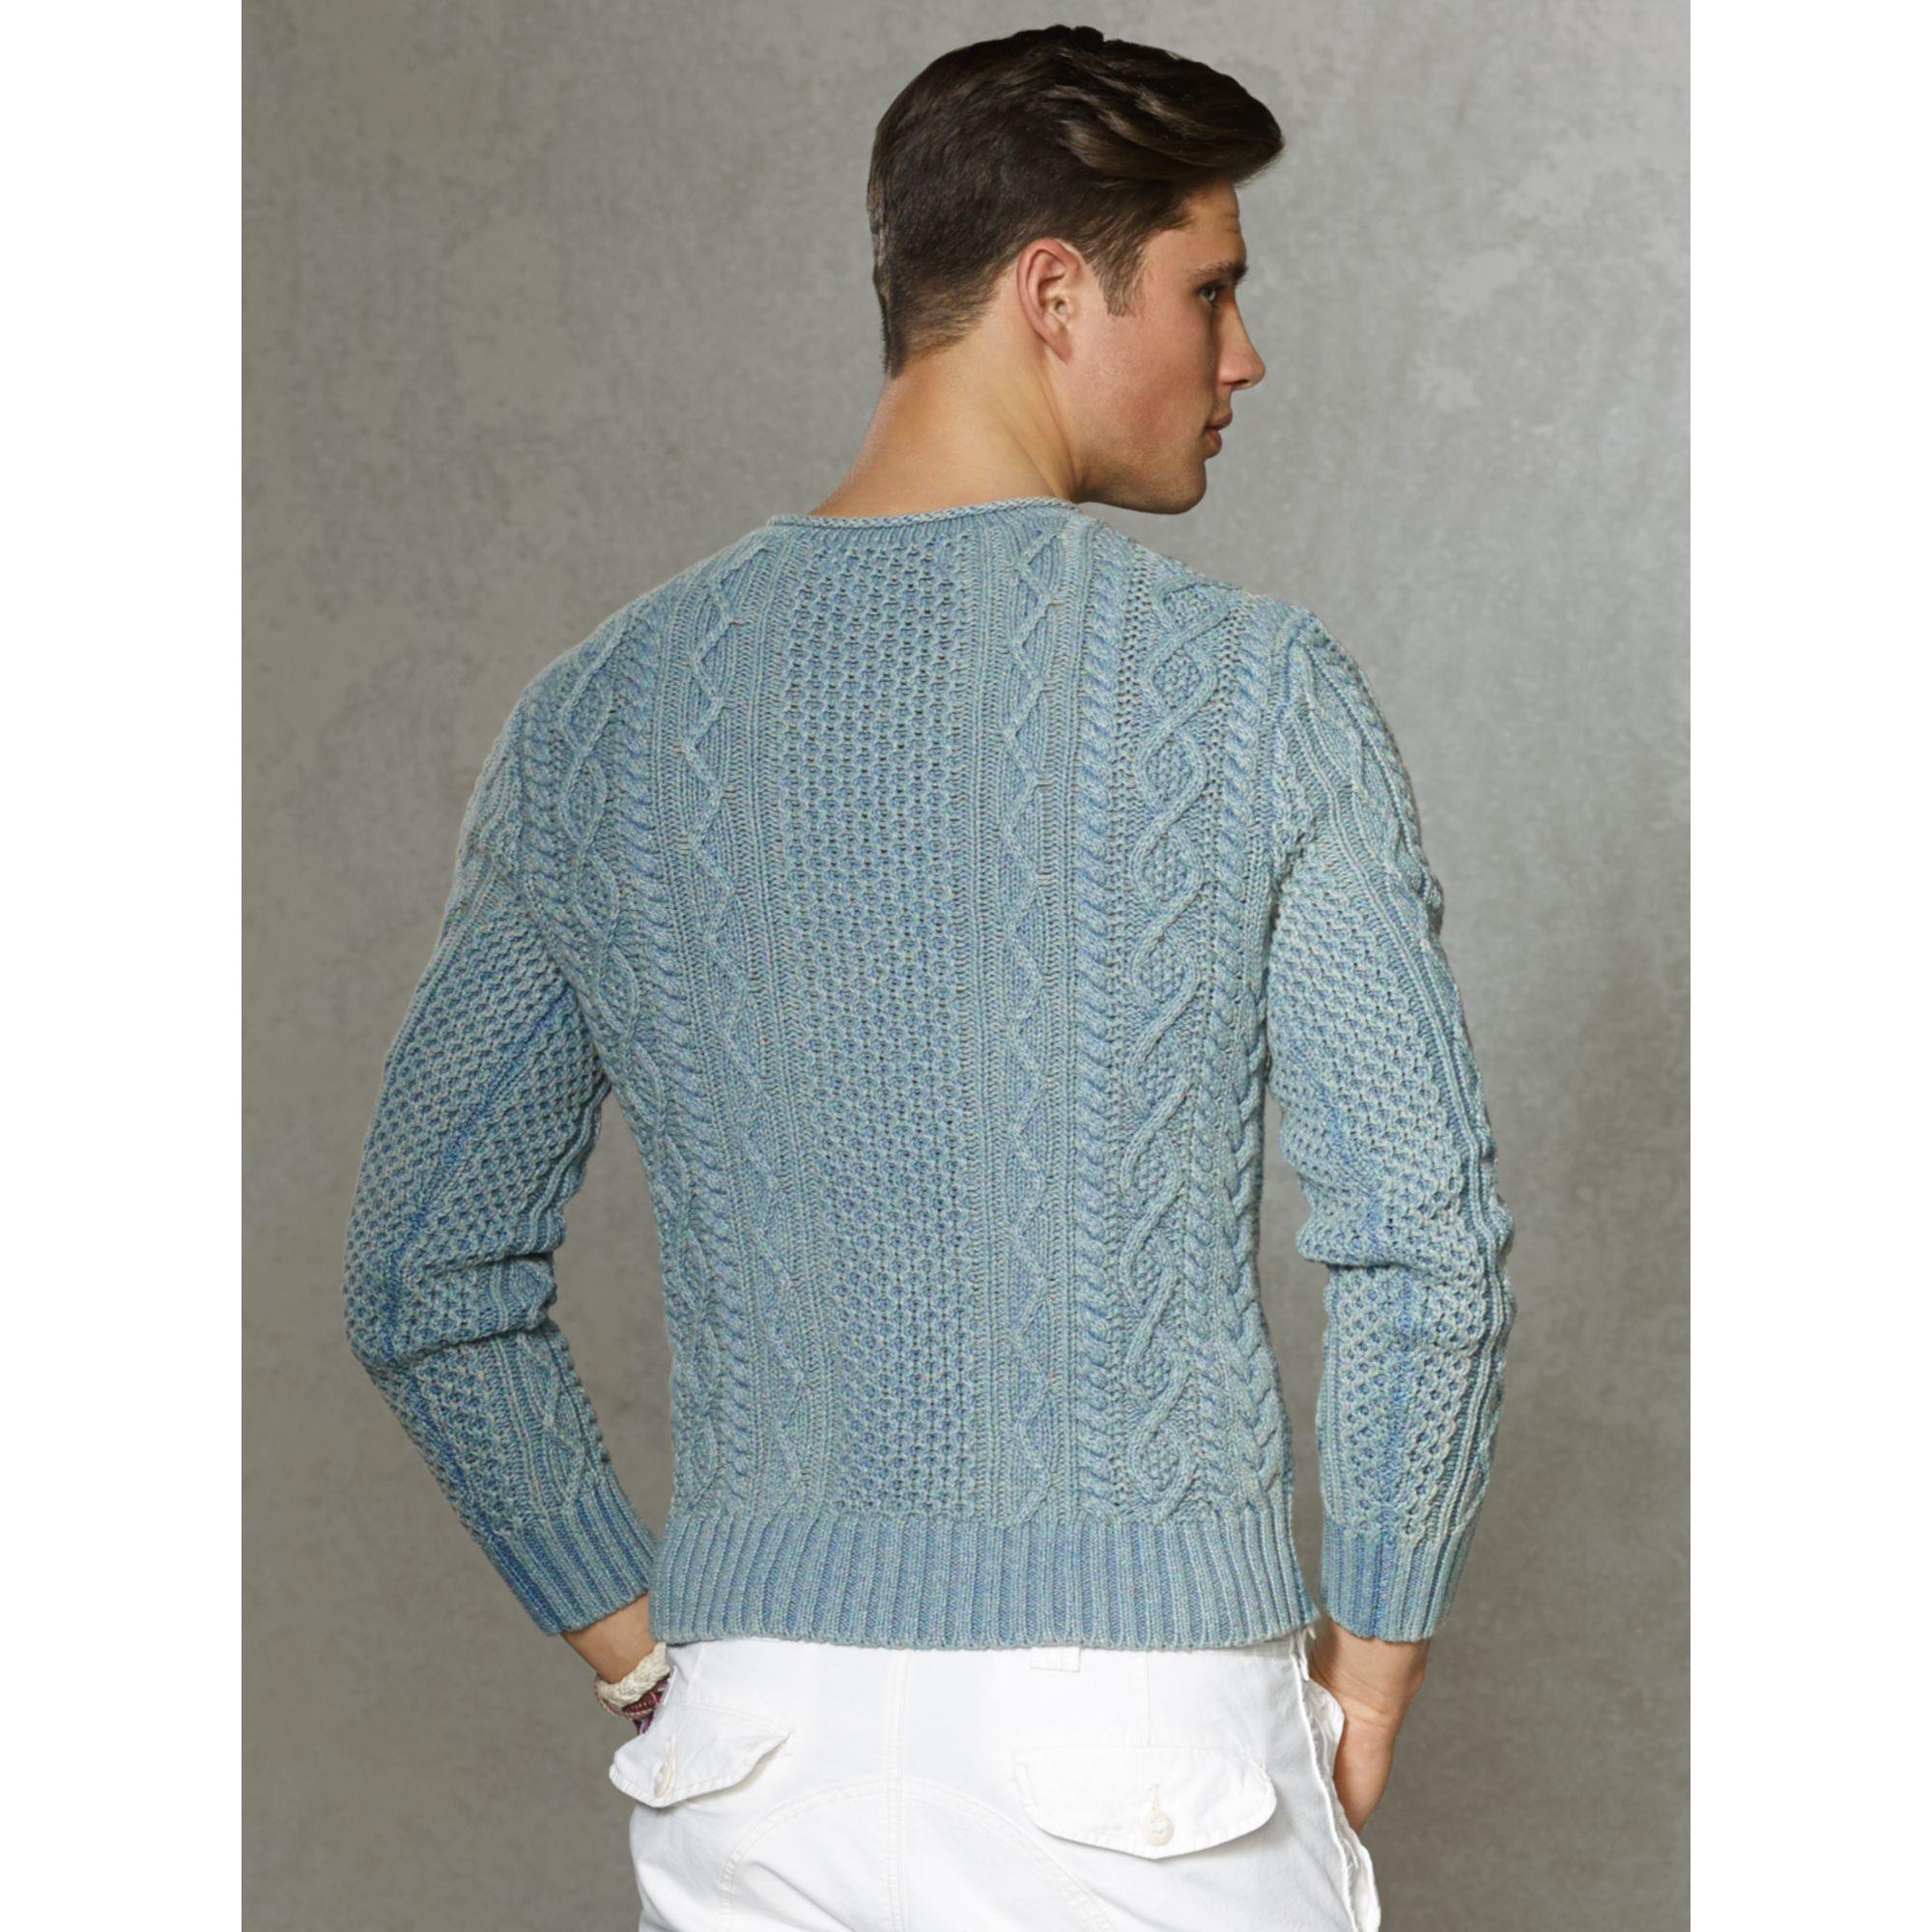 e67aea6cf ... cheap lyst polo ralph lauren indigo aran roll neck sweater in blue for  men a1f9f 8ef94